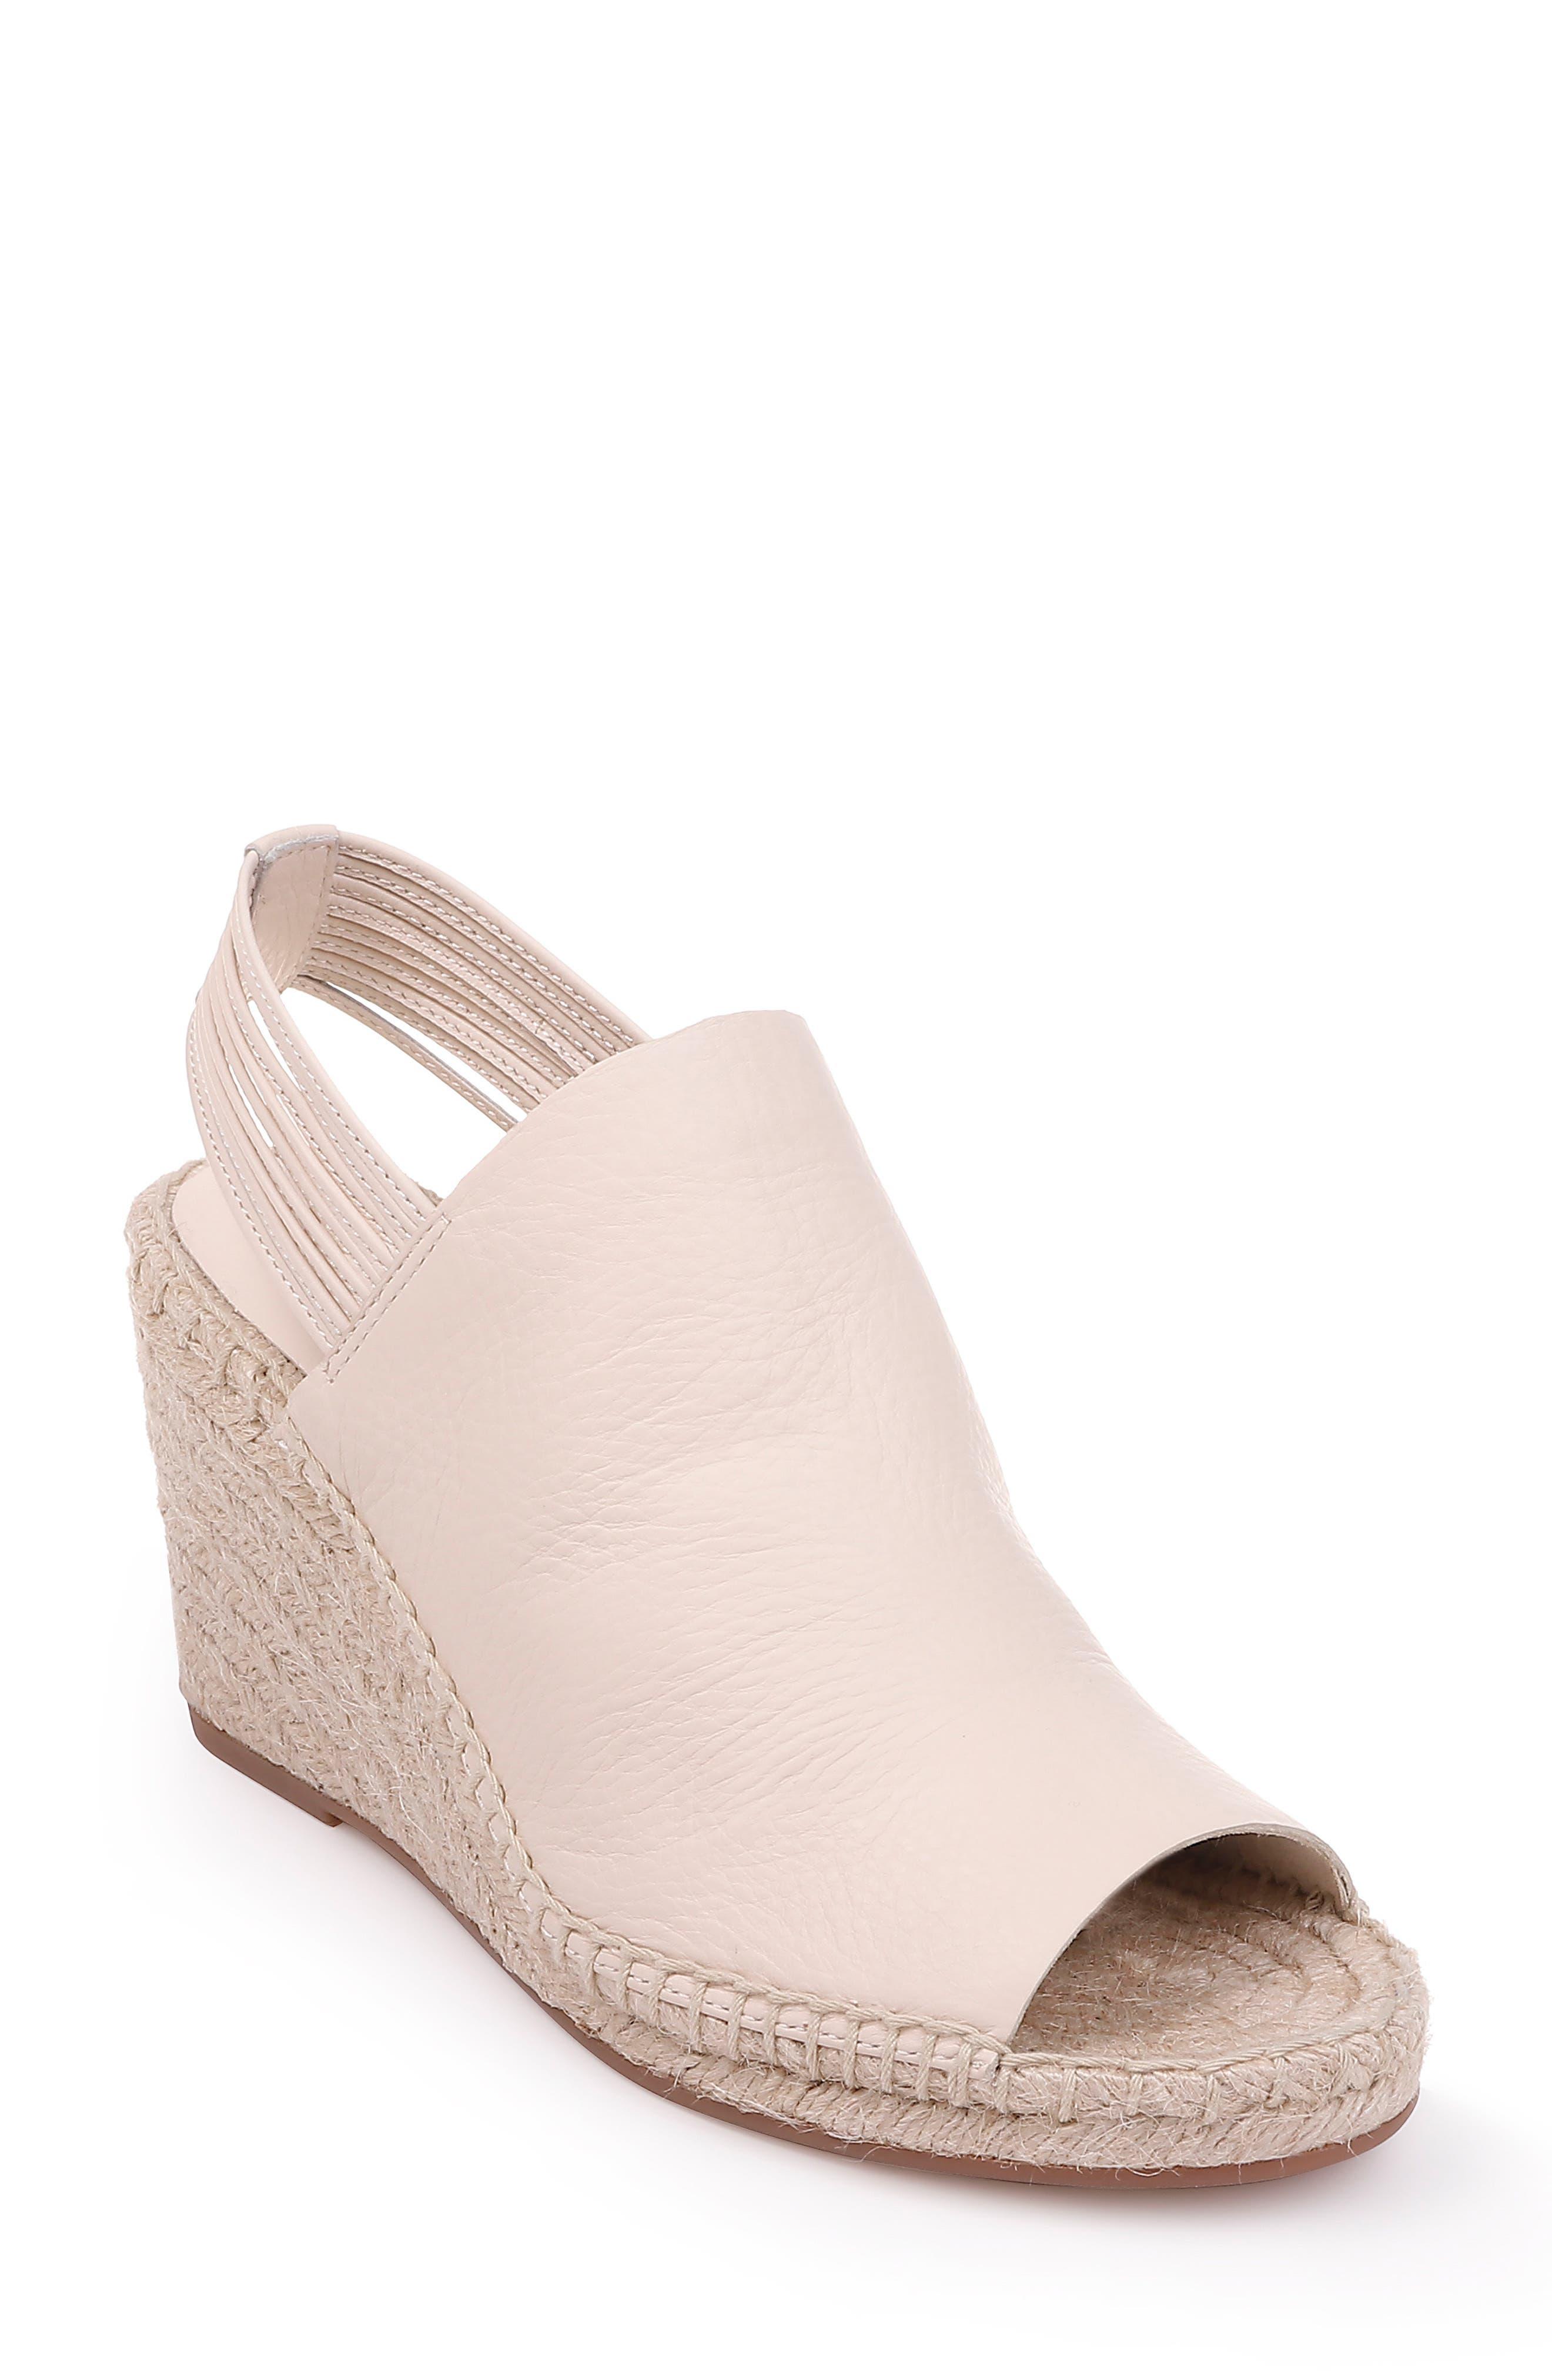 Splendid Simon Espadrille Wedge Sandal- Beige